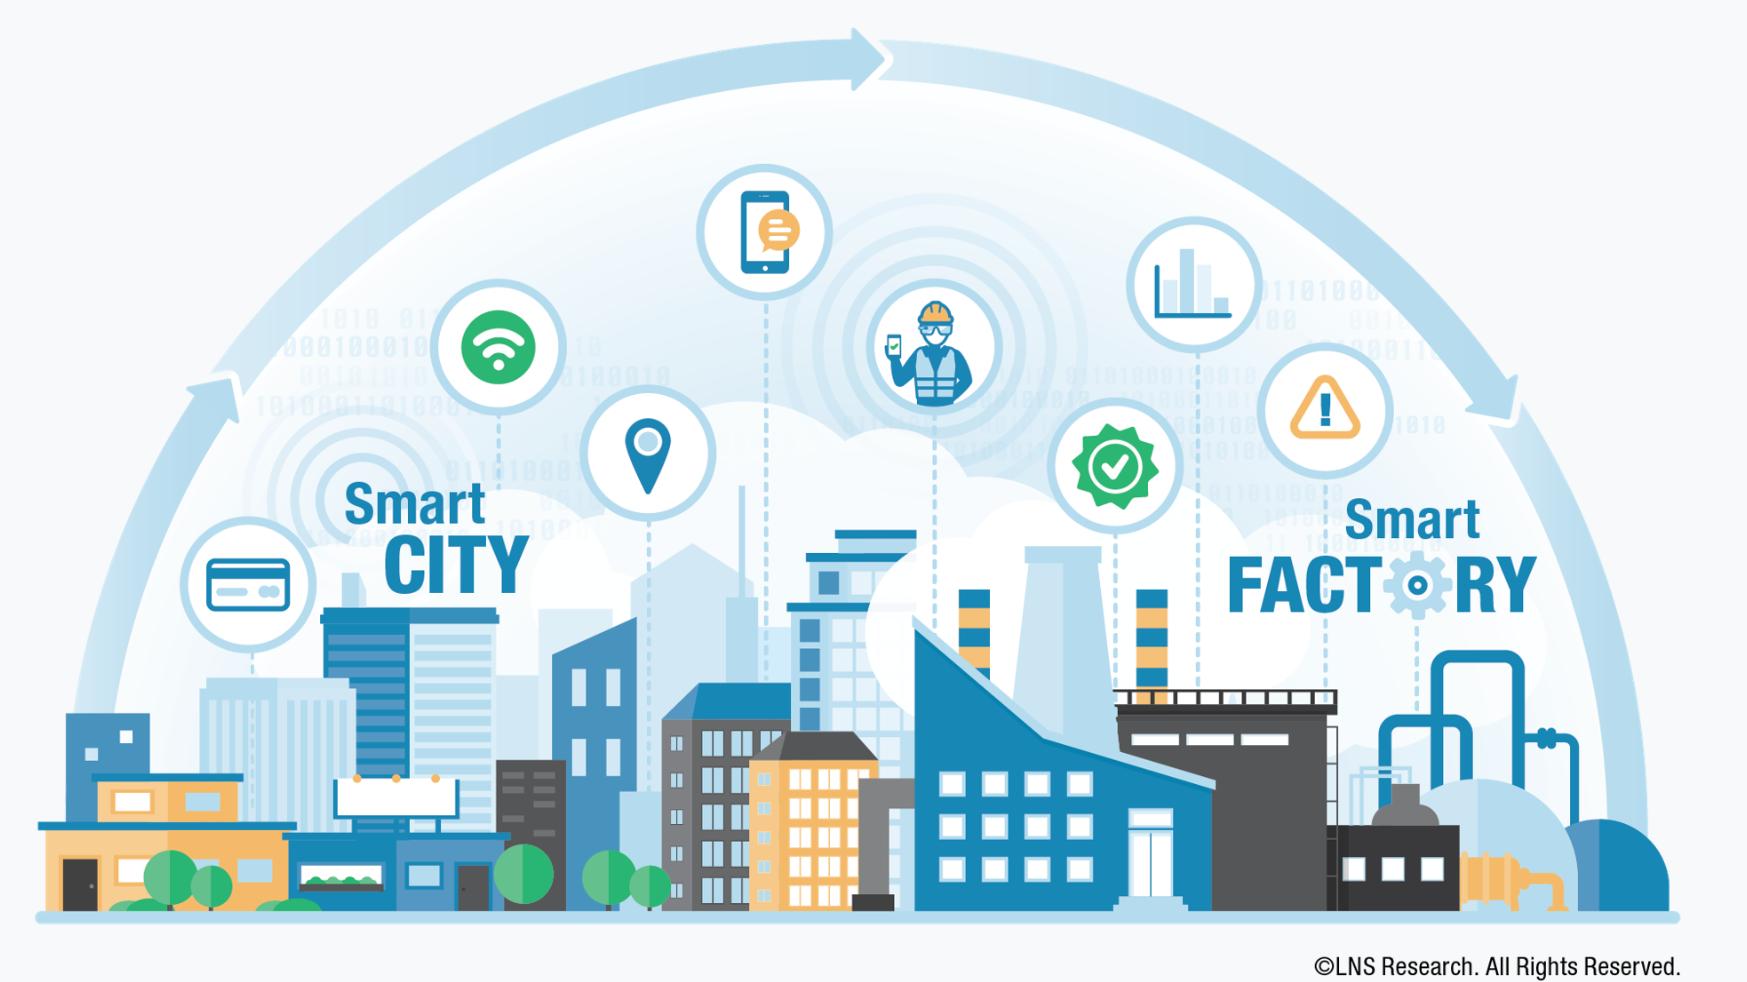 Smart City Smart Factory